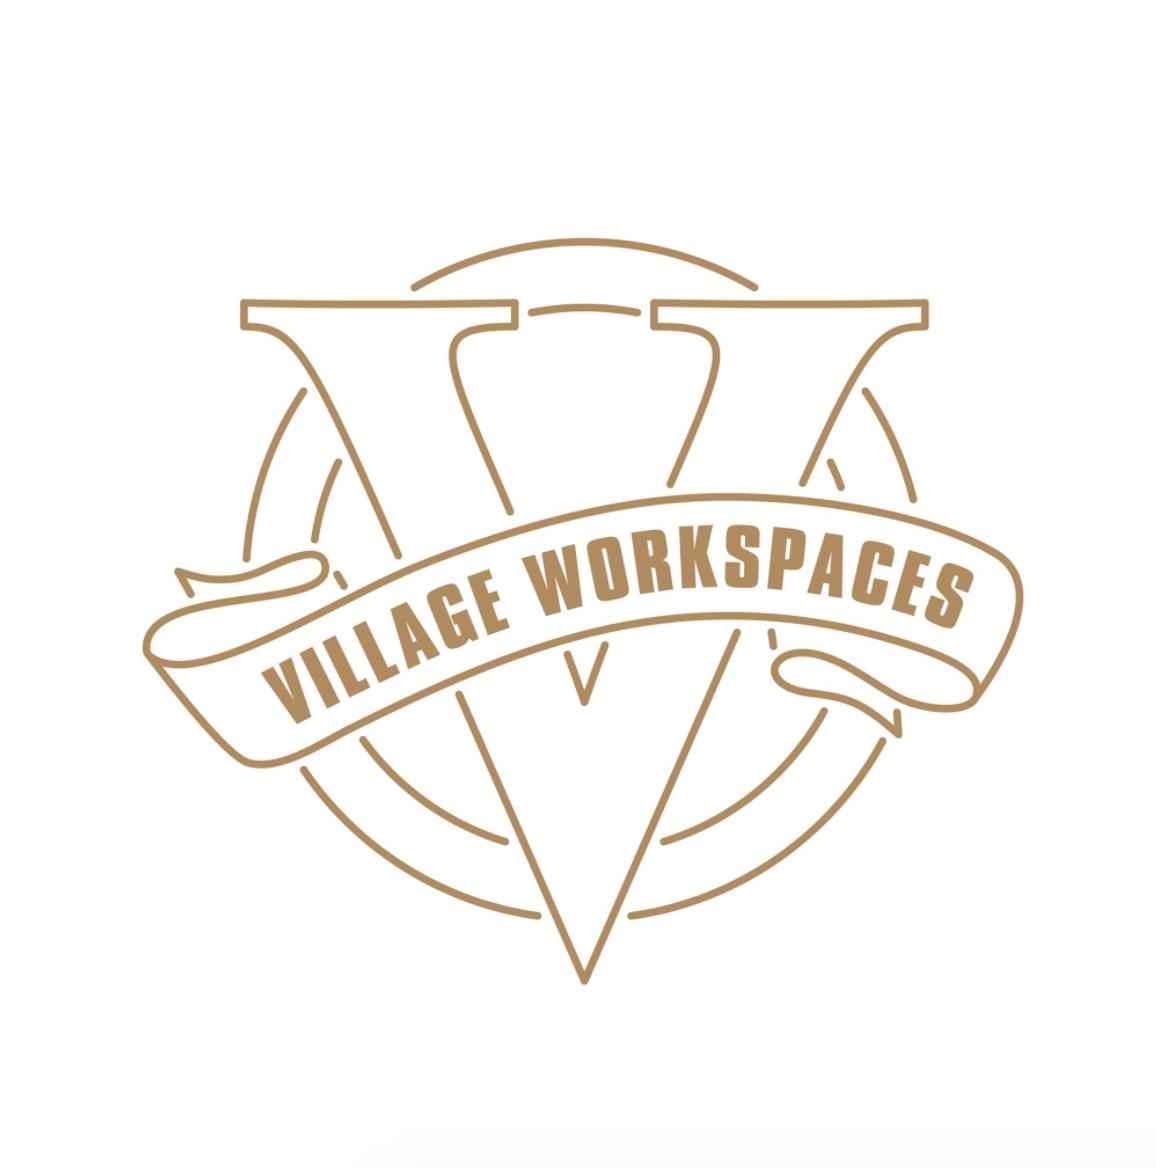 village-workspaces-sawtelle-santa-monica-coworking